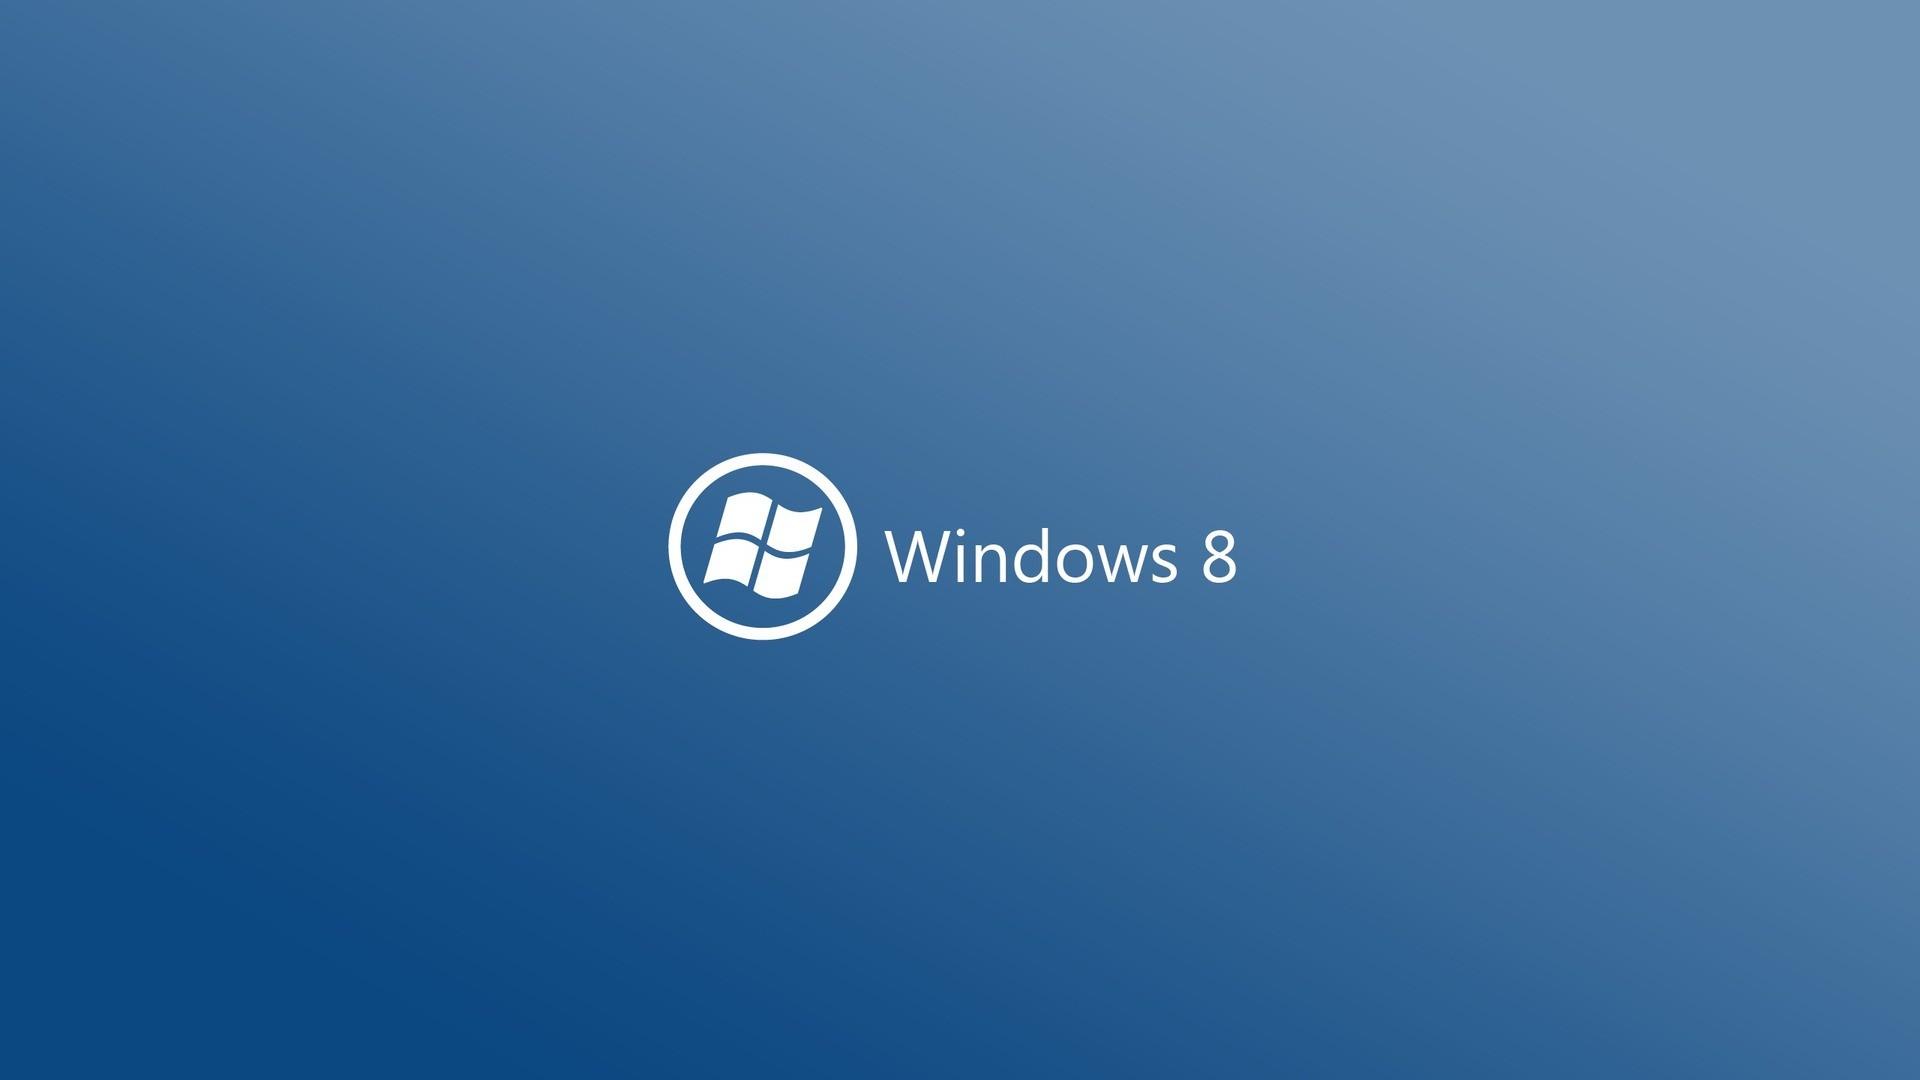 Windows8-Wallpapers-HD (10)